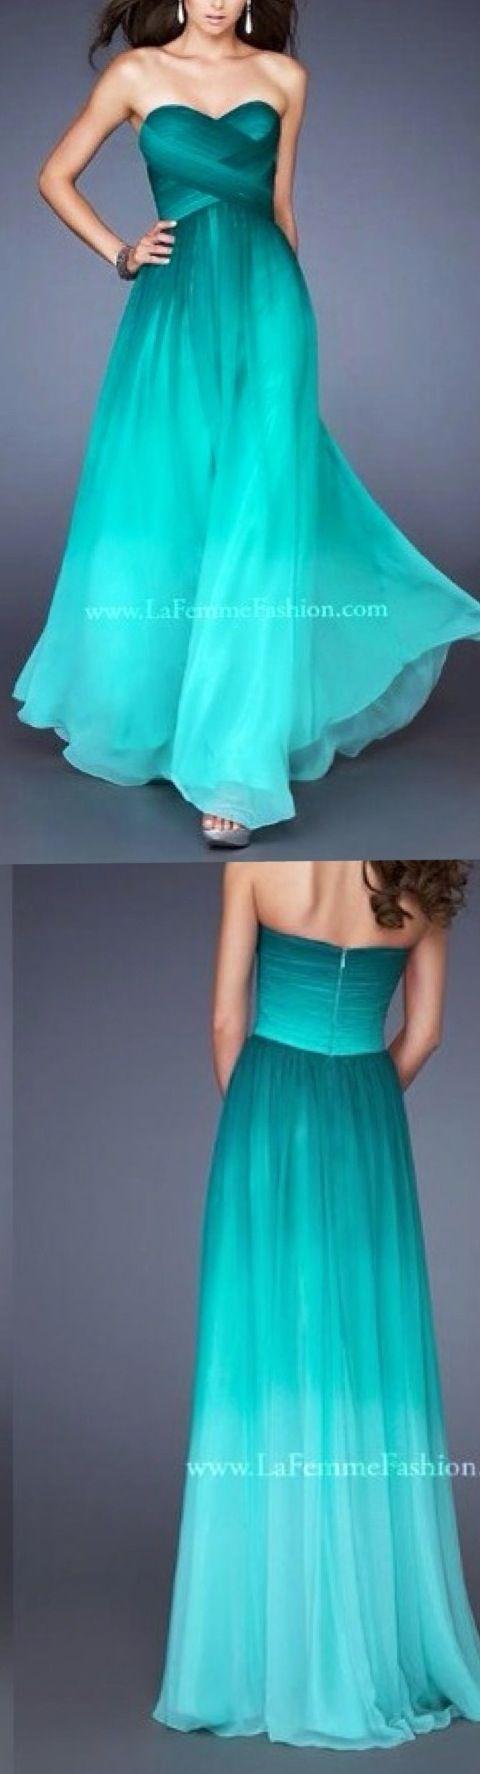 Aqua dress - THIS IS LIKE MY DREAM DRESS!!!!!!!!!!!!!!!!!!!!!!!!!!!!!!!!!!!!!!!!!!!!!!!